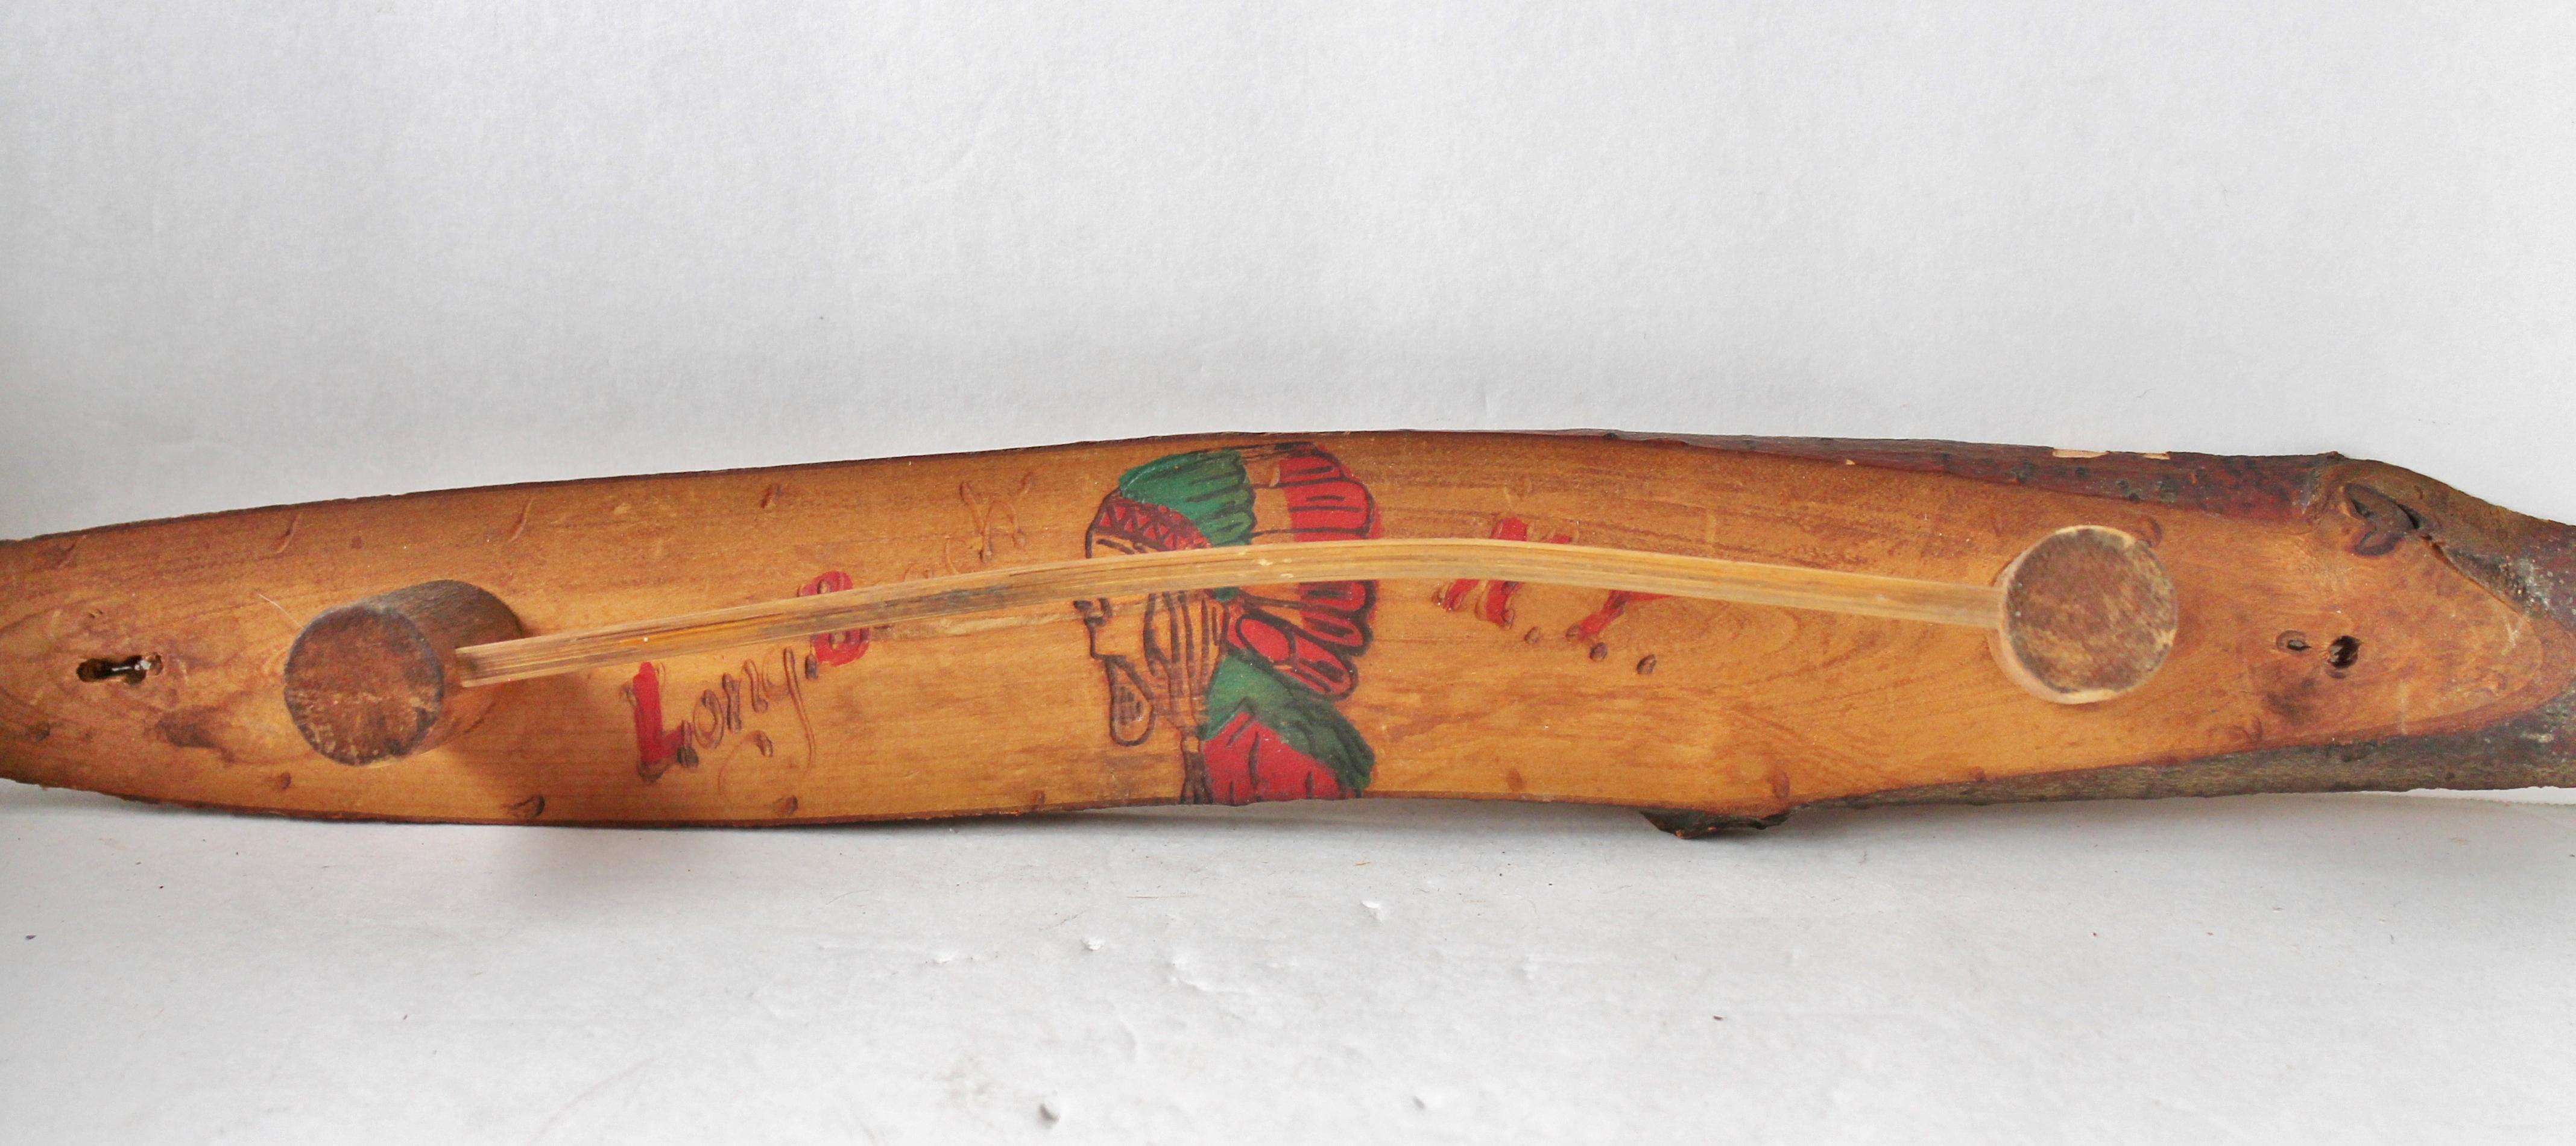 Wood-burned souvenir rack with American Indian head